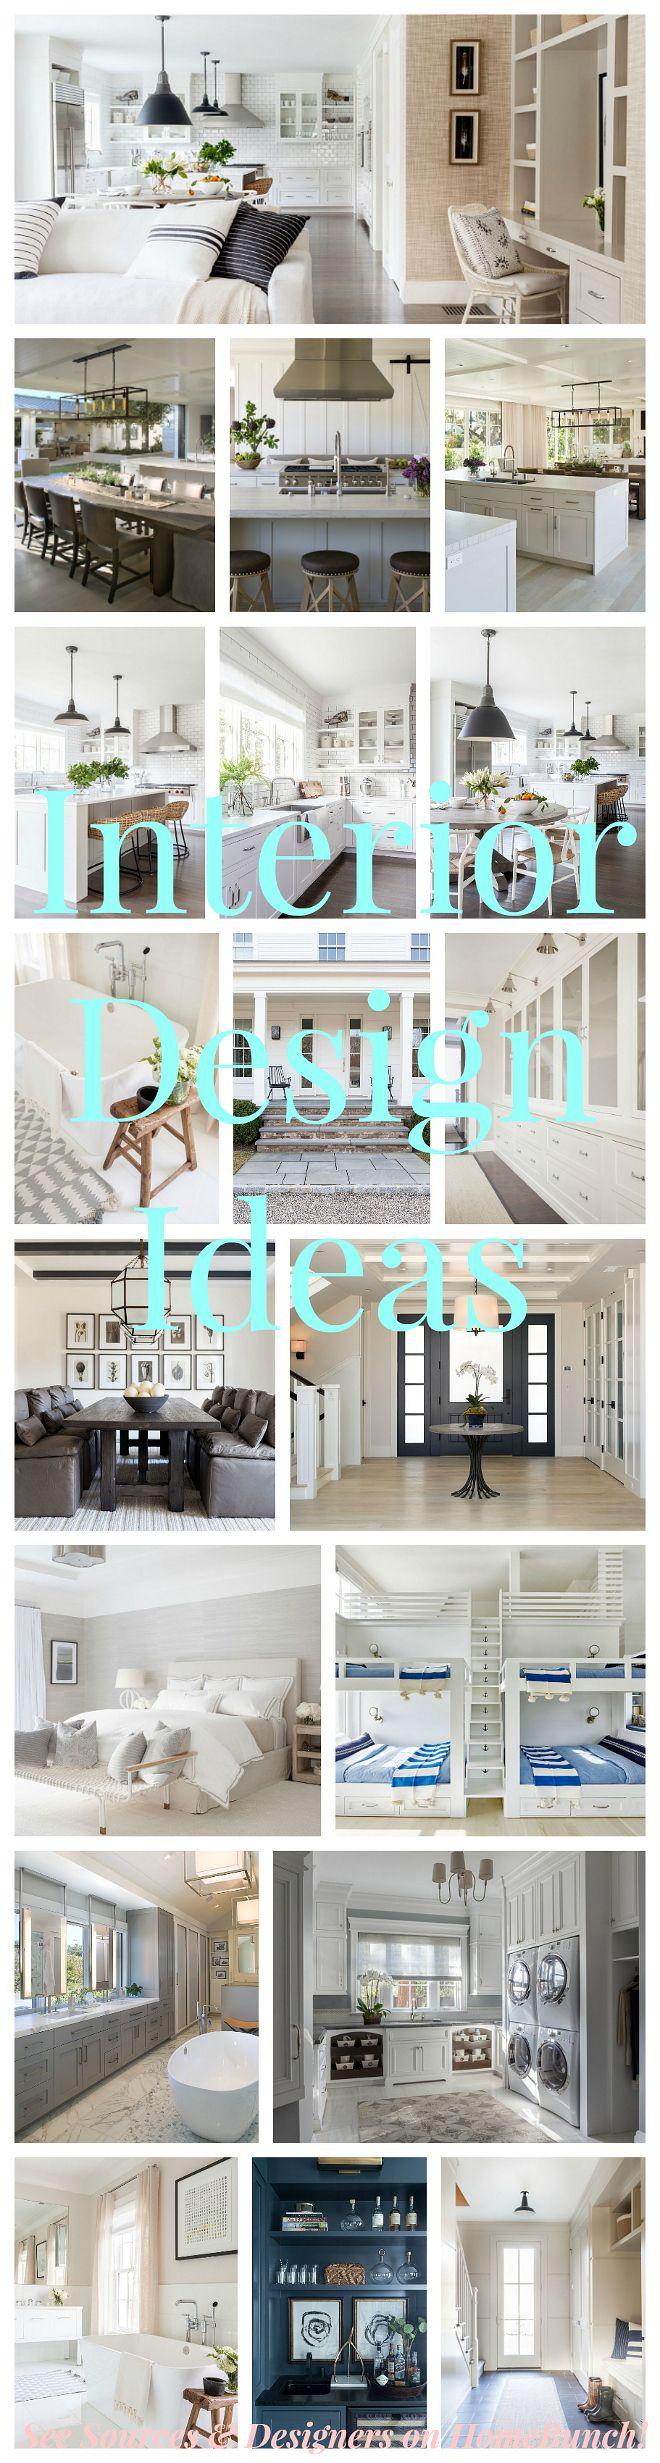 10 stunning hardwood flooring options interior design - 10 Beautiful Hardwood Flooring Ideas Flooring Optionsflooring Ideascottage Interiorsdecorating